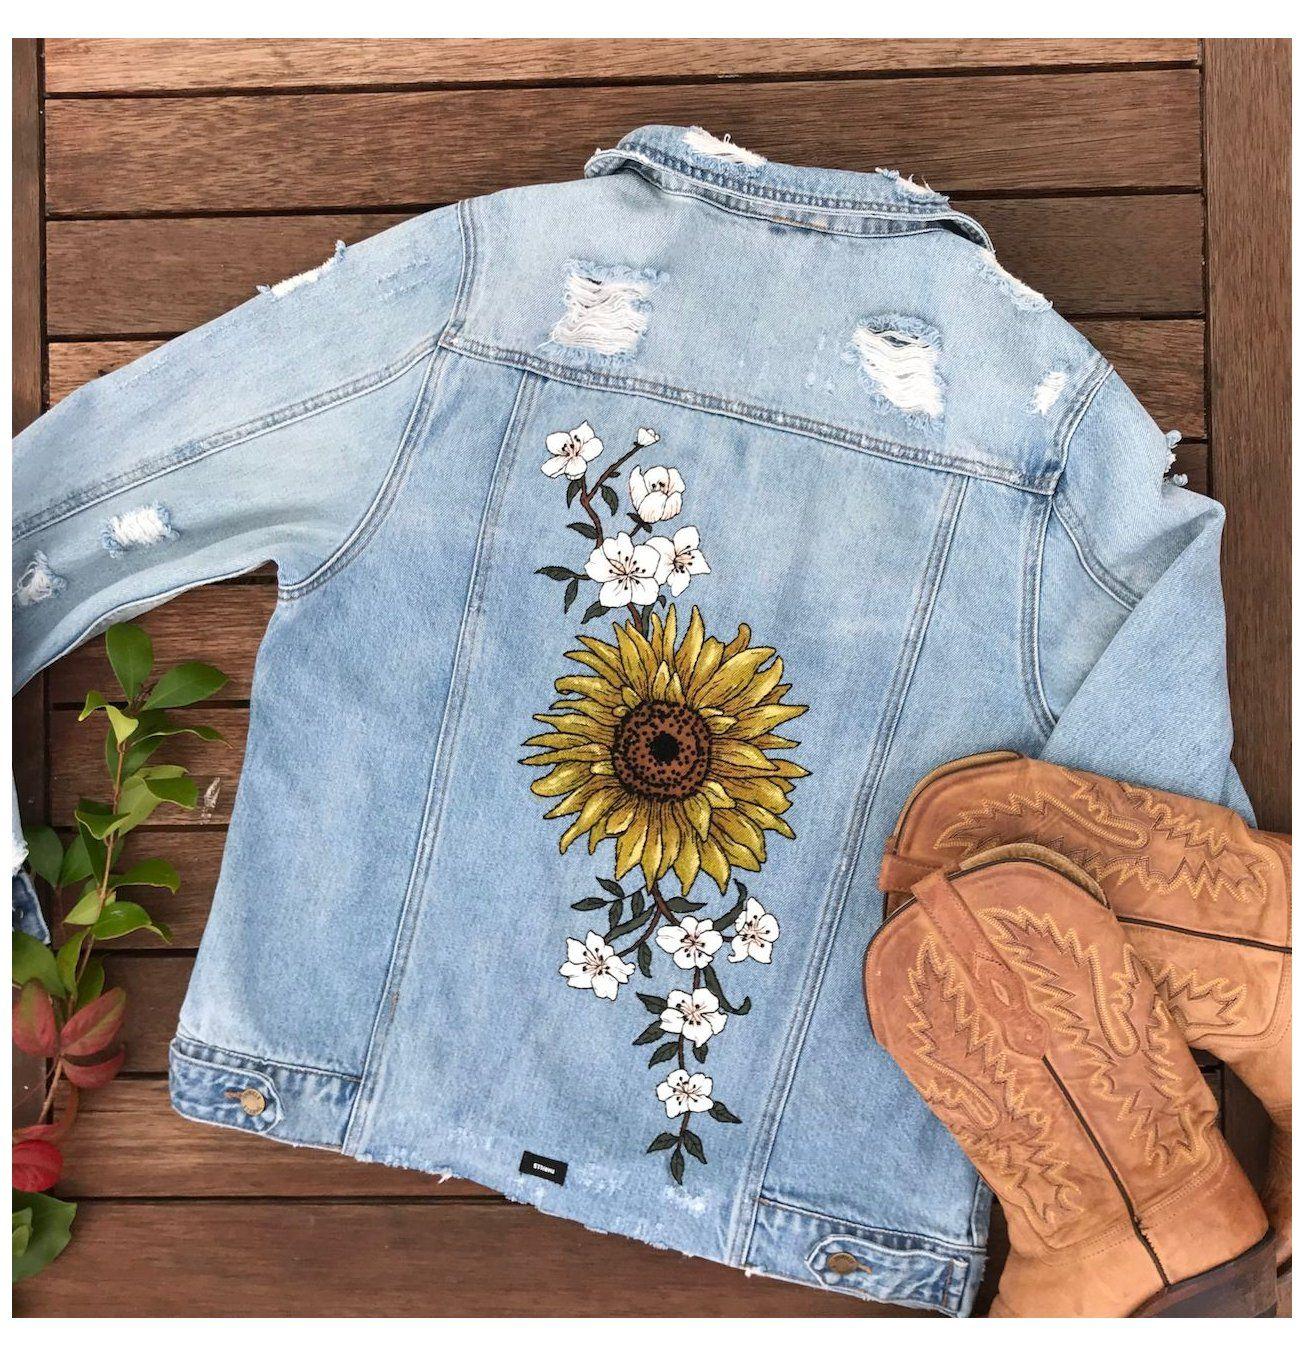 Beautifully Frank Custom Made Jackets Hand Painted Denim Jacket Sunflowers Handpainteddenimja In 2021 Hand Painted Denim Jacket Painted Denim Painted Clothes Diy [ 1356 x 1304 Pixel ]